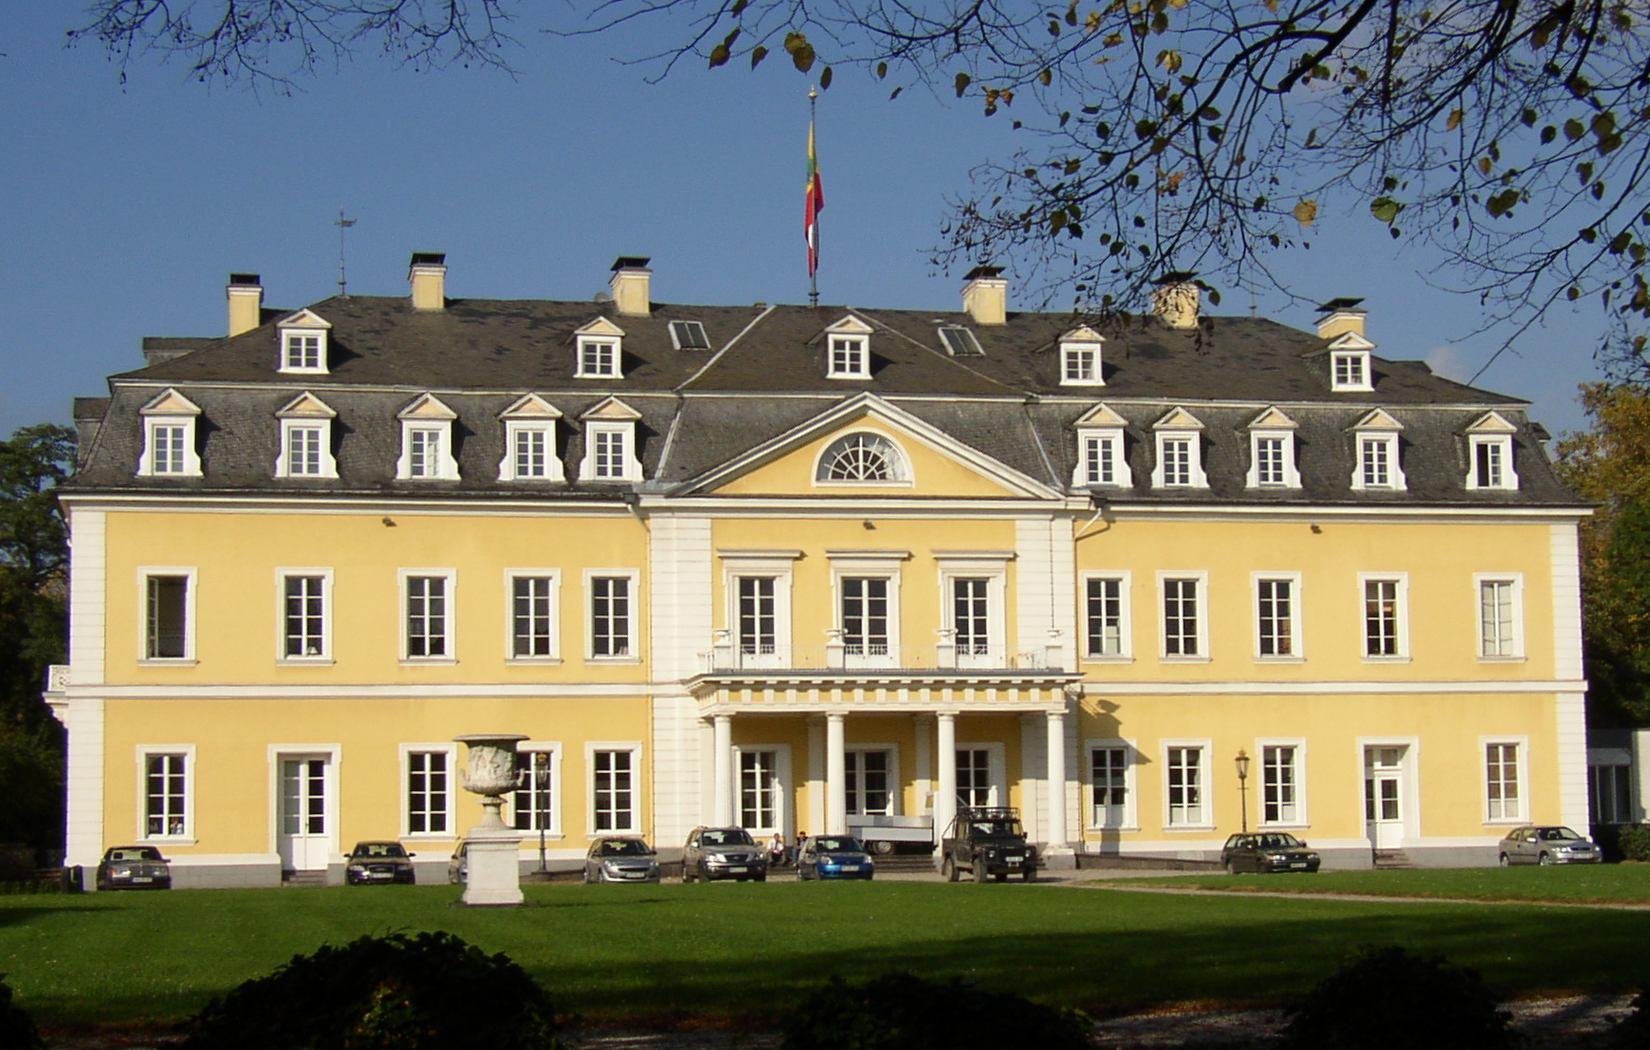 phoenix marie Neuwied(Rhineland-Palatinate)